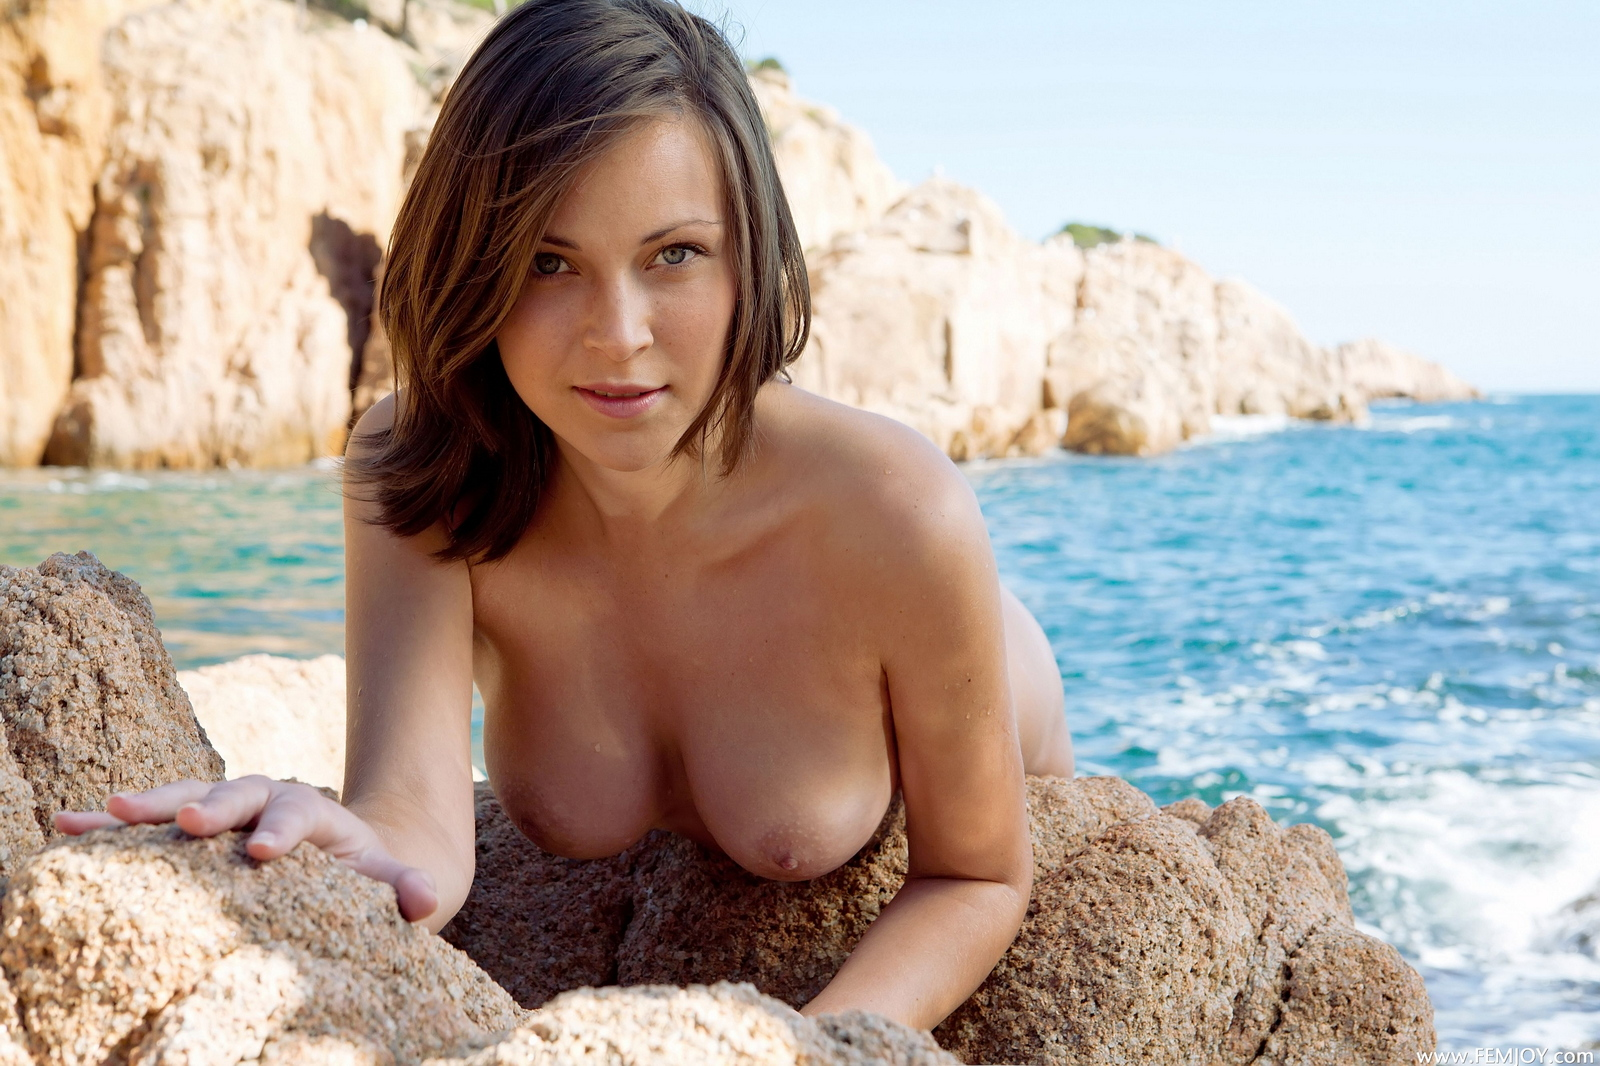 sophia-h-seaside-naked-boobs-rocks-femjoy-22